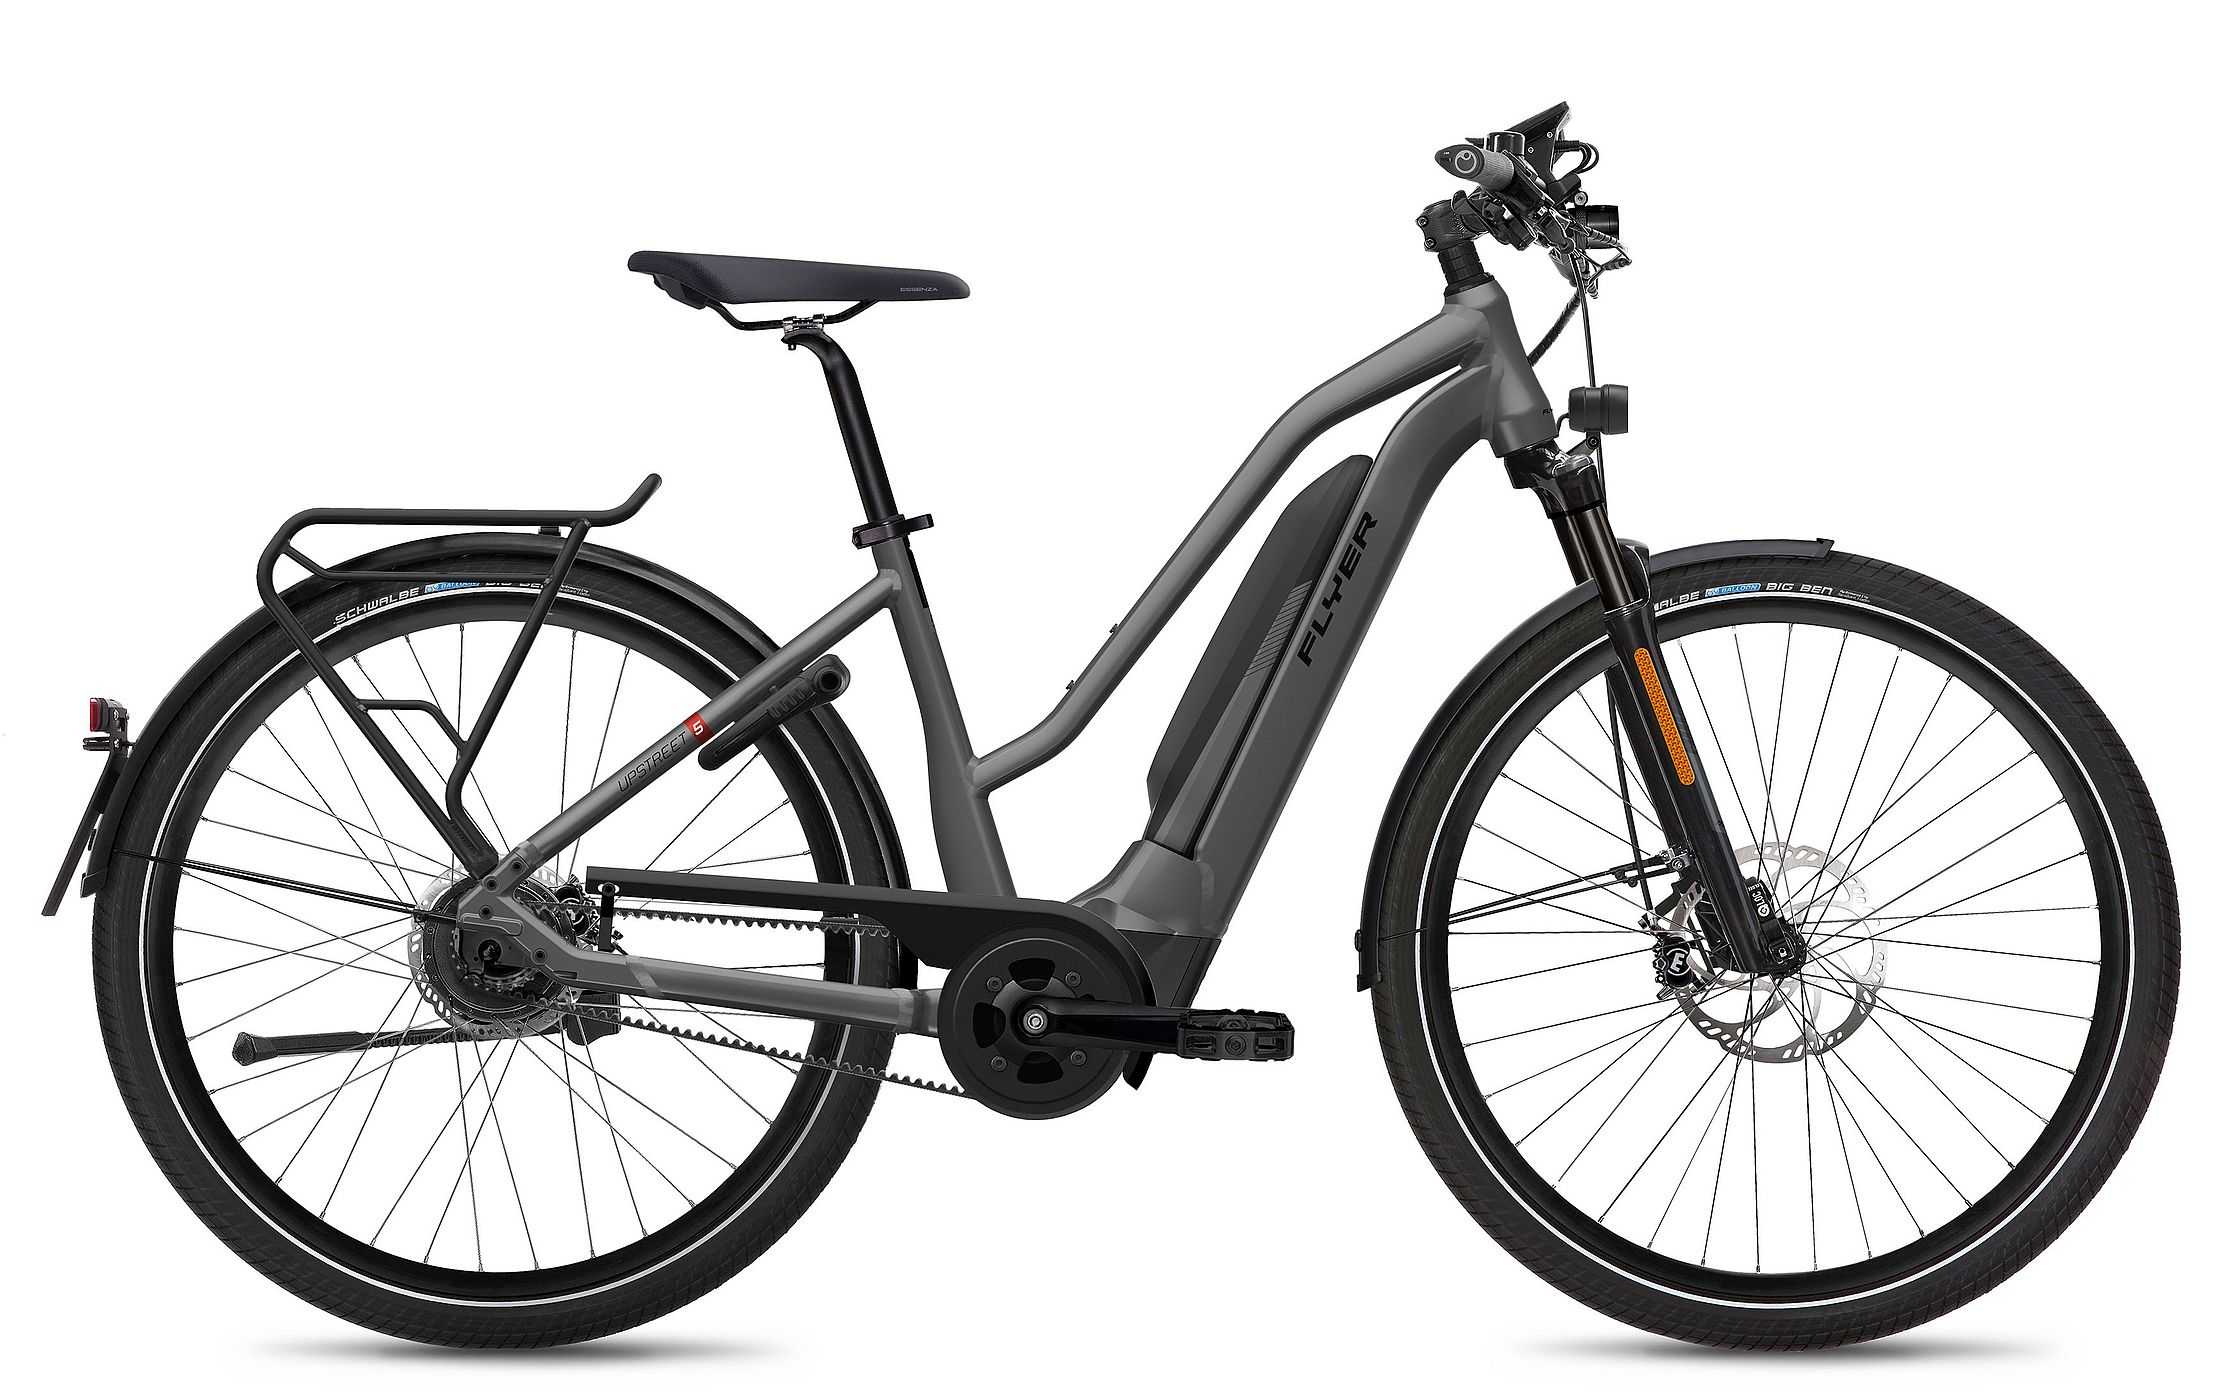 FLYER_E-Bikes_MY21_Upstreet5_783_Mixed_HS_EU_AnthraciteGloss